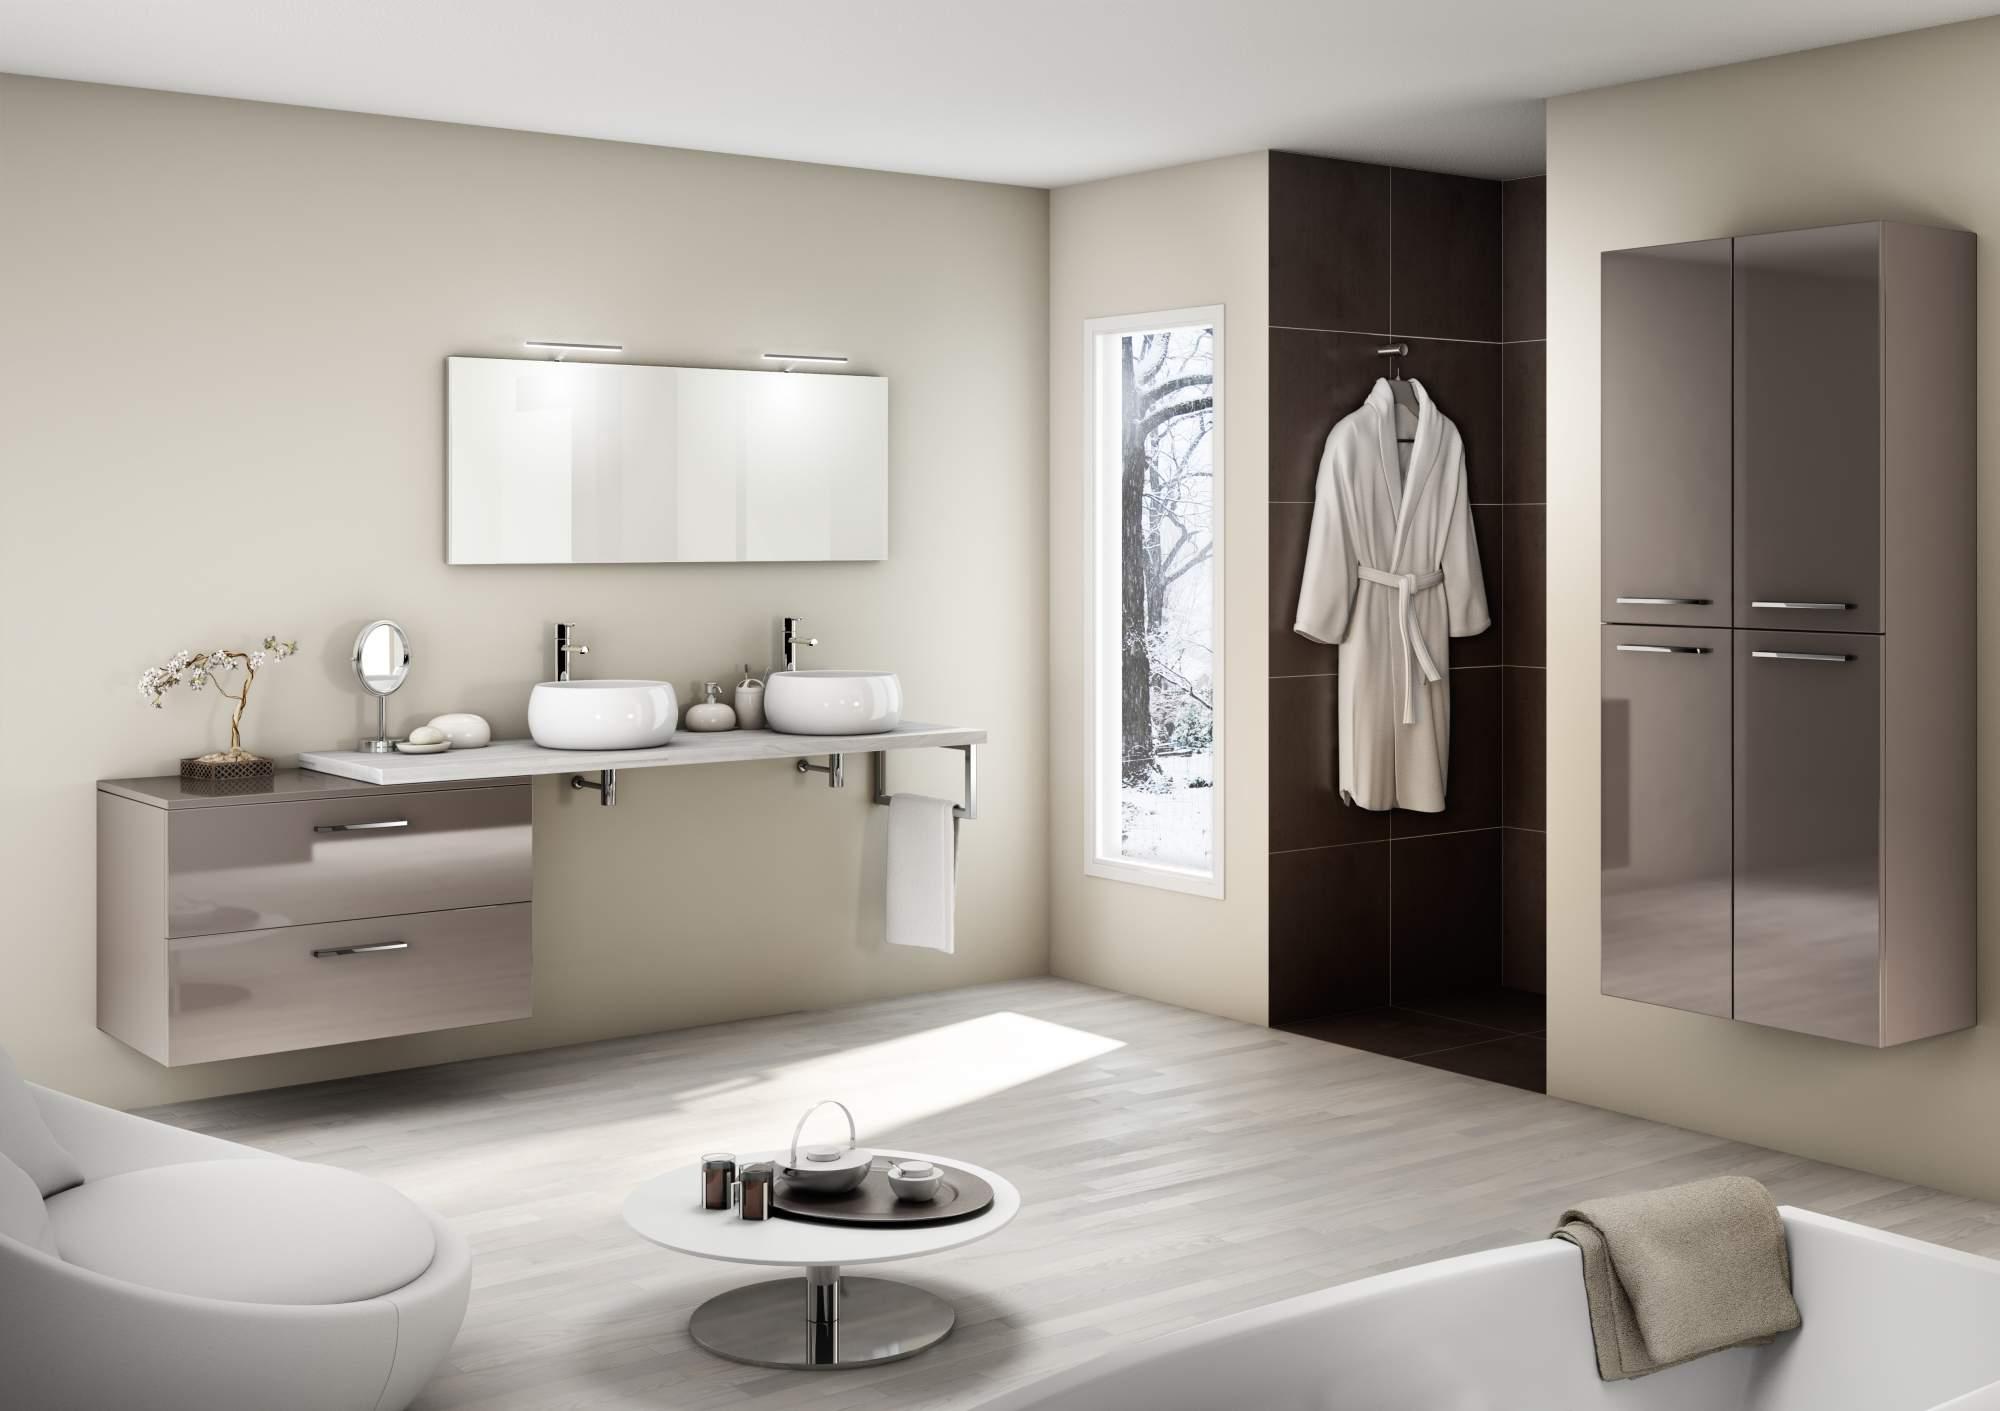 vente de meuble suspendu taupe brillant 2 tiroirs bouches. Black Bedroom Furniture Sets. Home Design Ideas